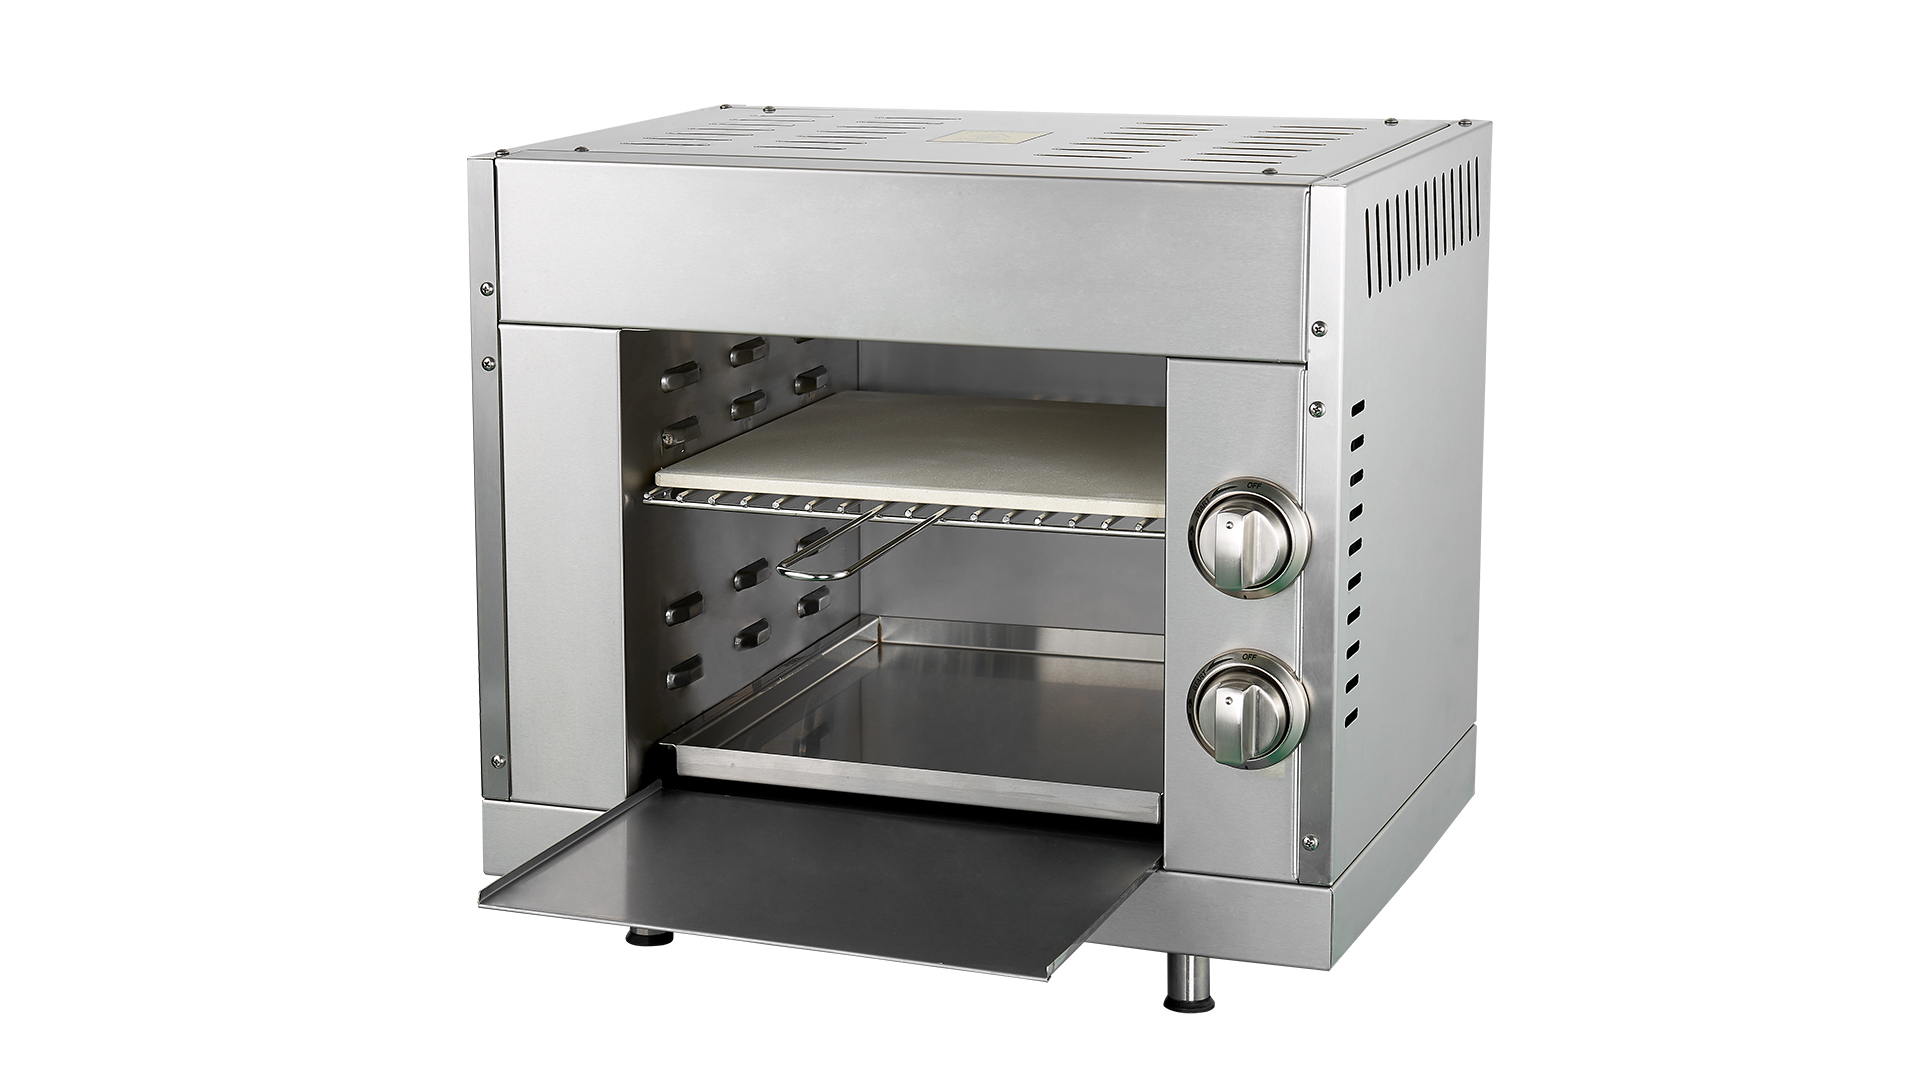 WS-020 Streak / Pizza ҳавопаймоӣ